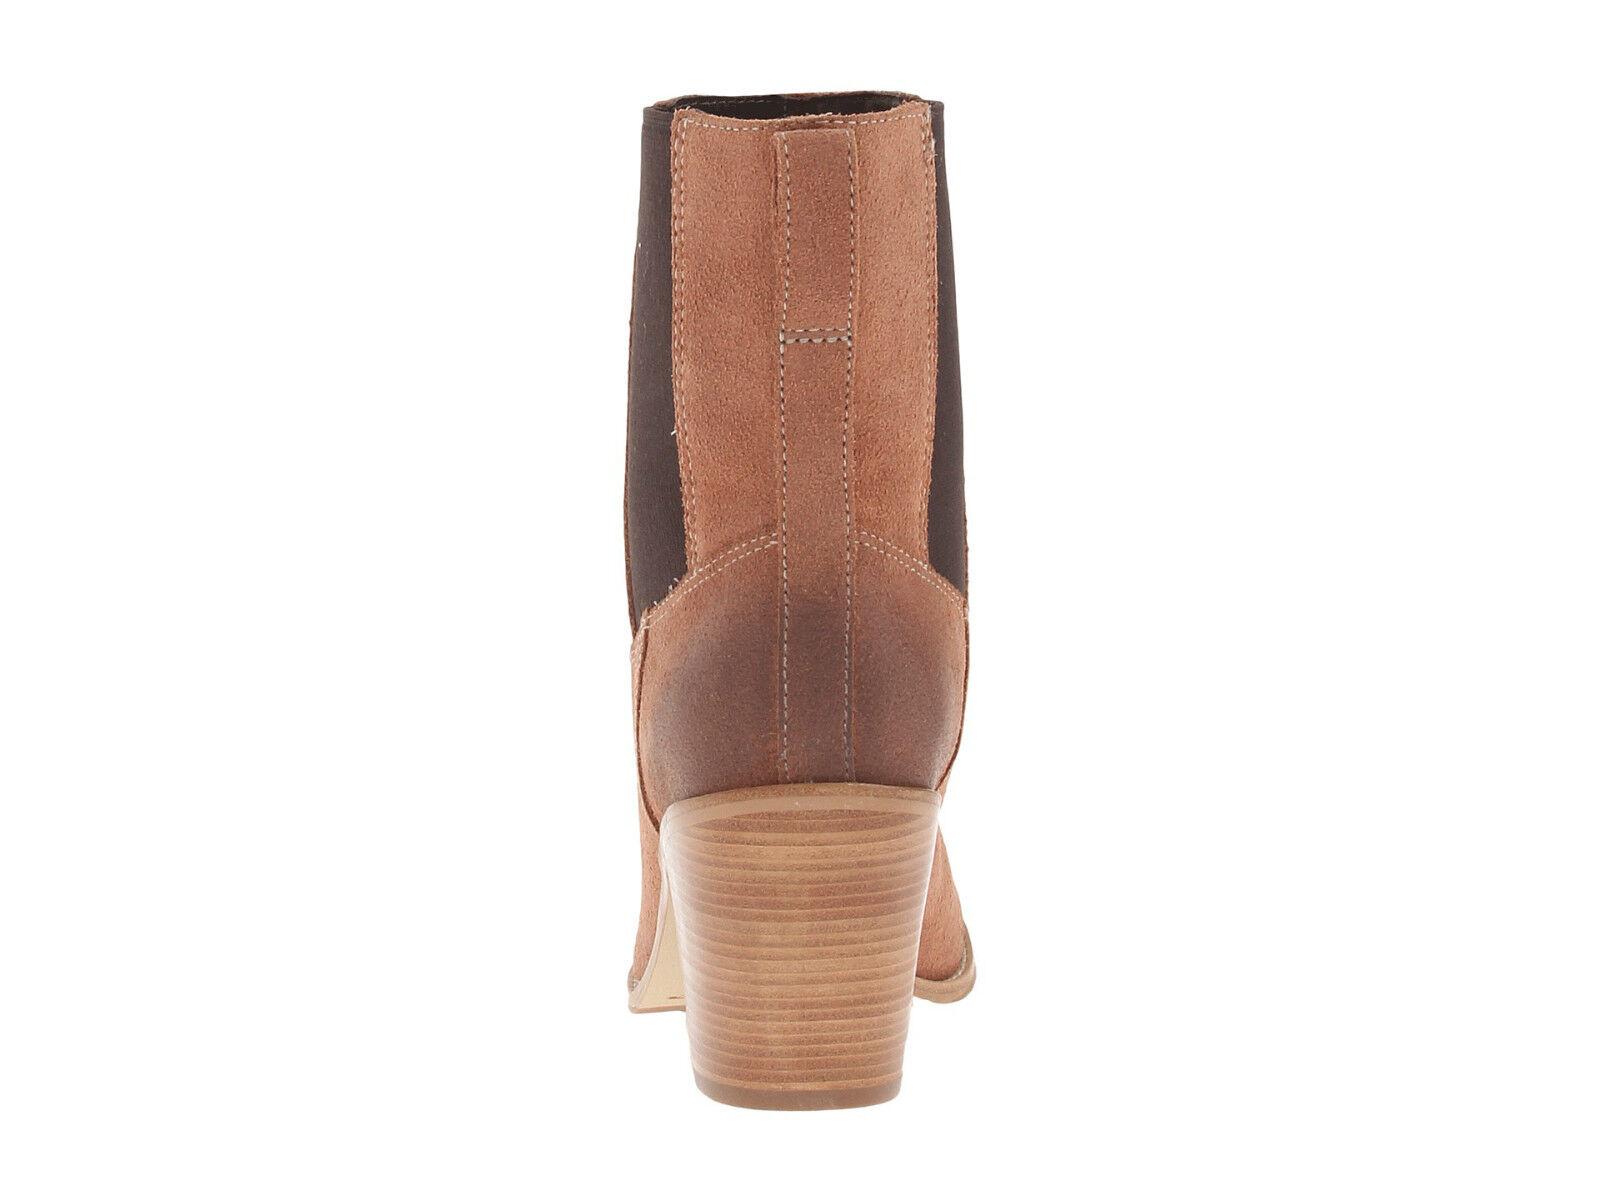 New Cole Haan NYC GRAHAM Damens Waterproof Short Sz Stiefel Sz Short 10 (MSRP 298) D40356 e9b1fd